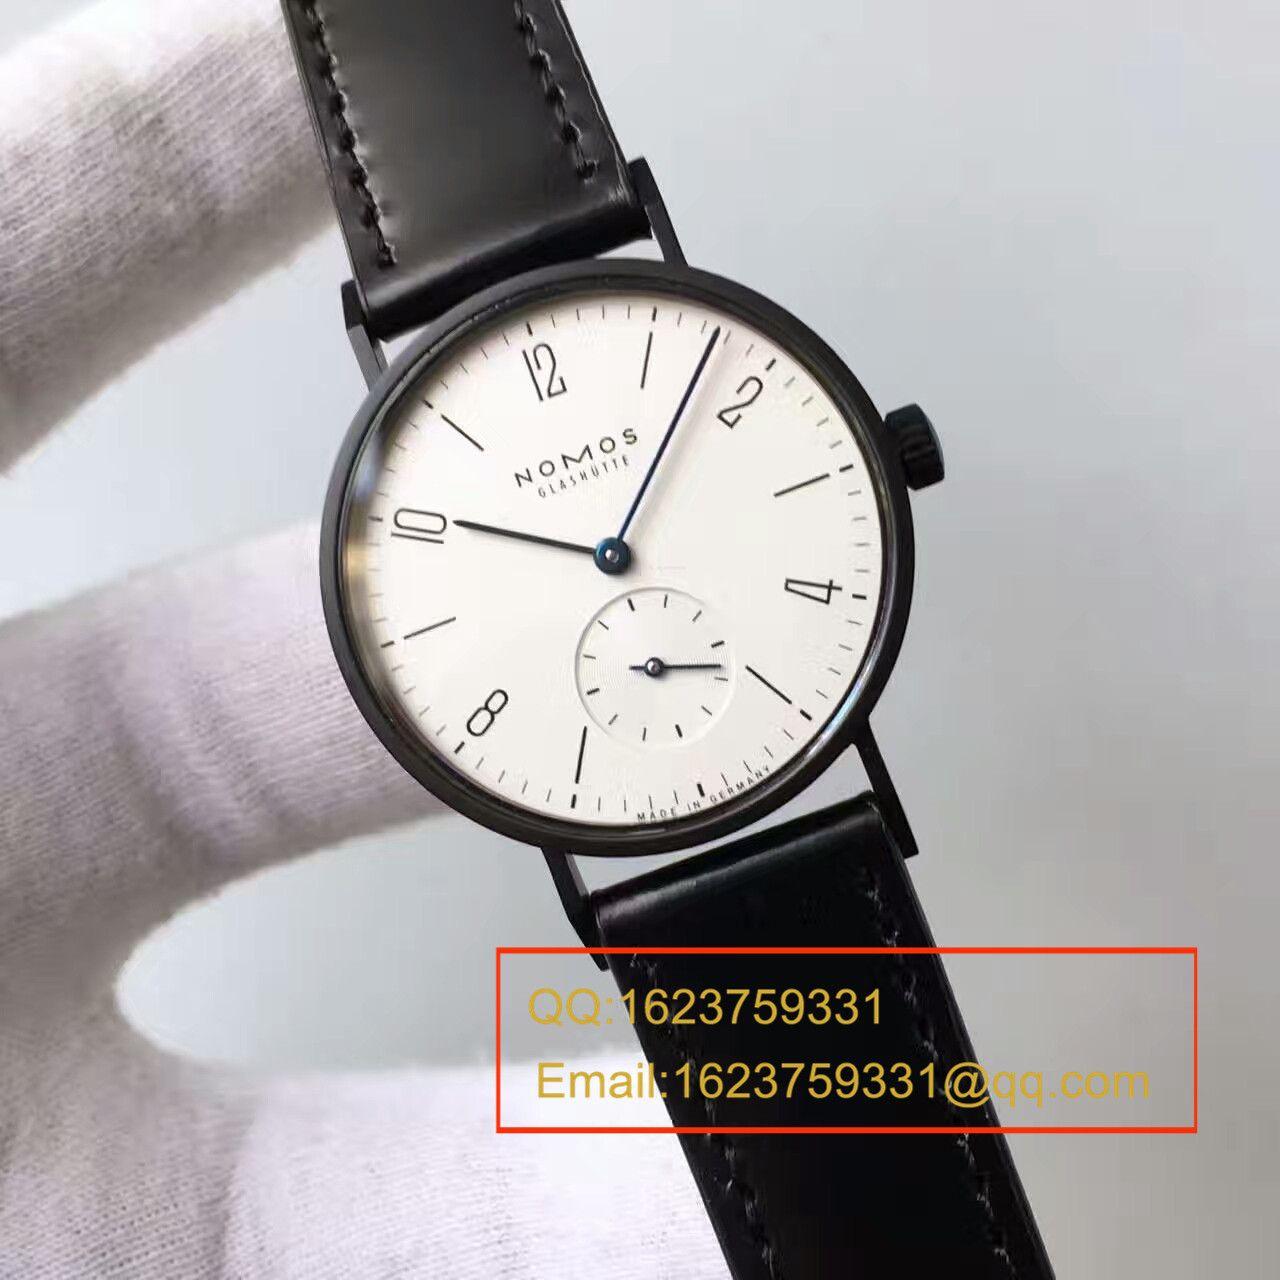 【OS厂一比一高仿手表】NOMOS诺莫斯包豪斯 TANGOMAT系列603腕表集合、多款可选